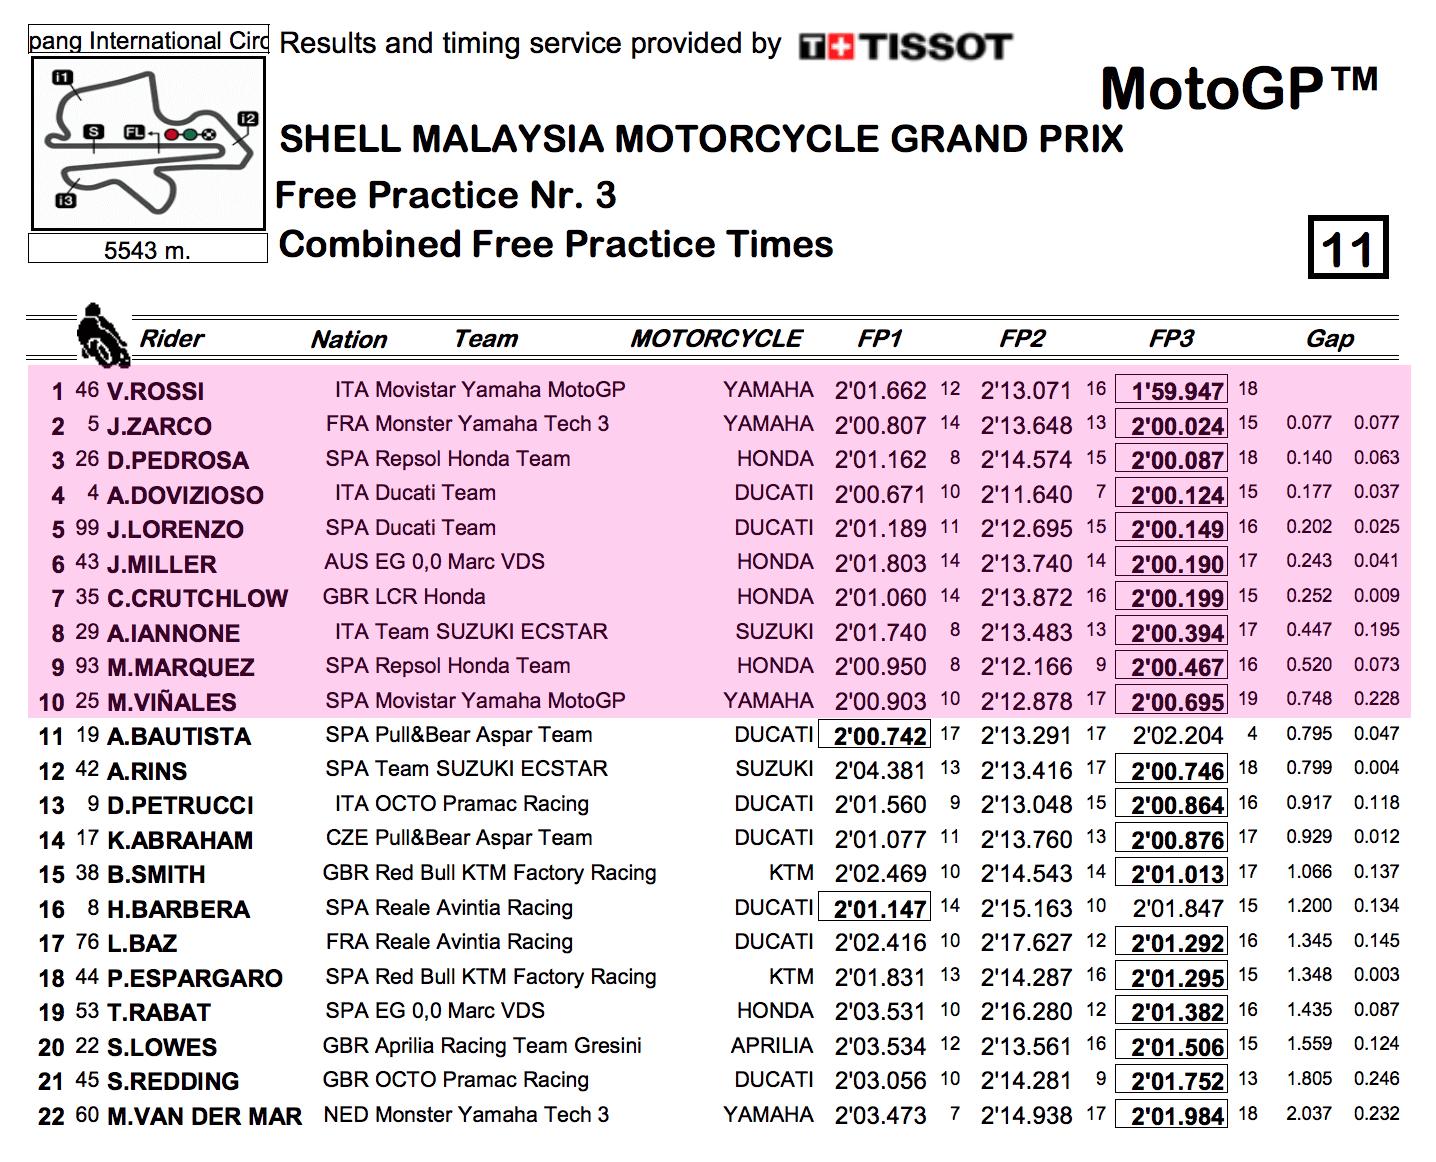 ★MotoGP2017マレーシアGP FP1-FP3総合結果